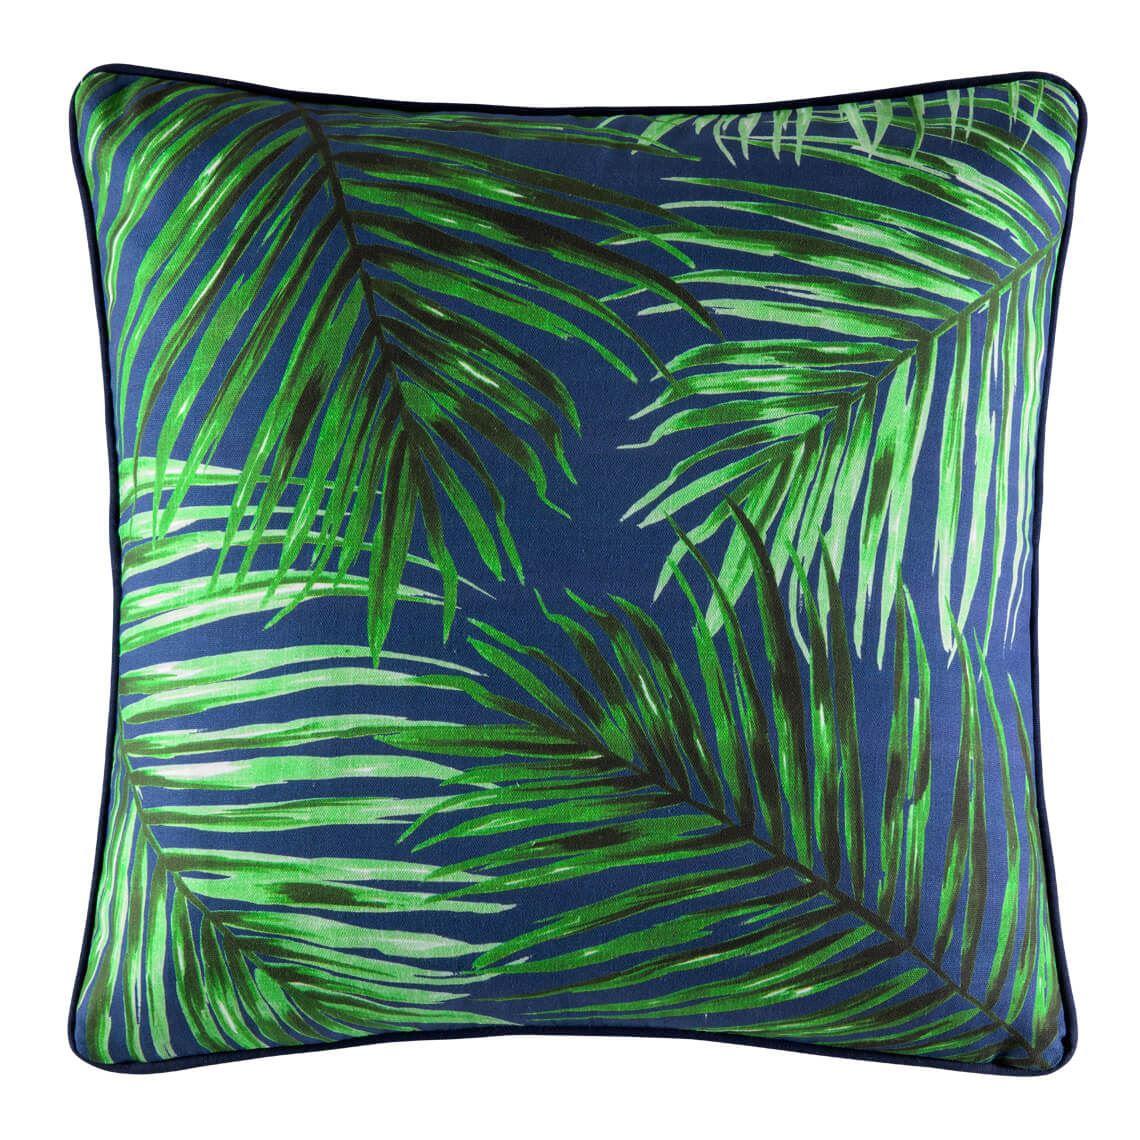 Scopello Outdoor Cushion Size W 50cm x D 15cm x H 50cm Freedom